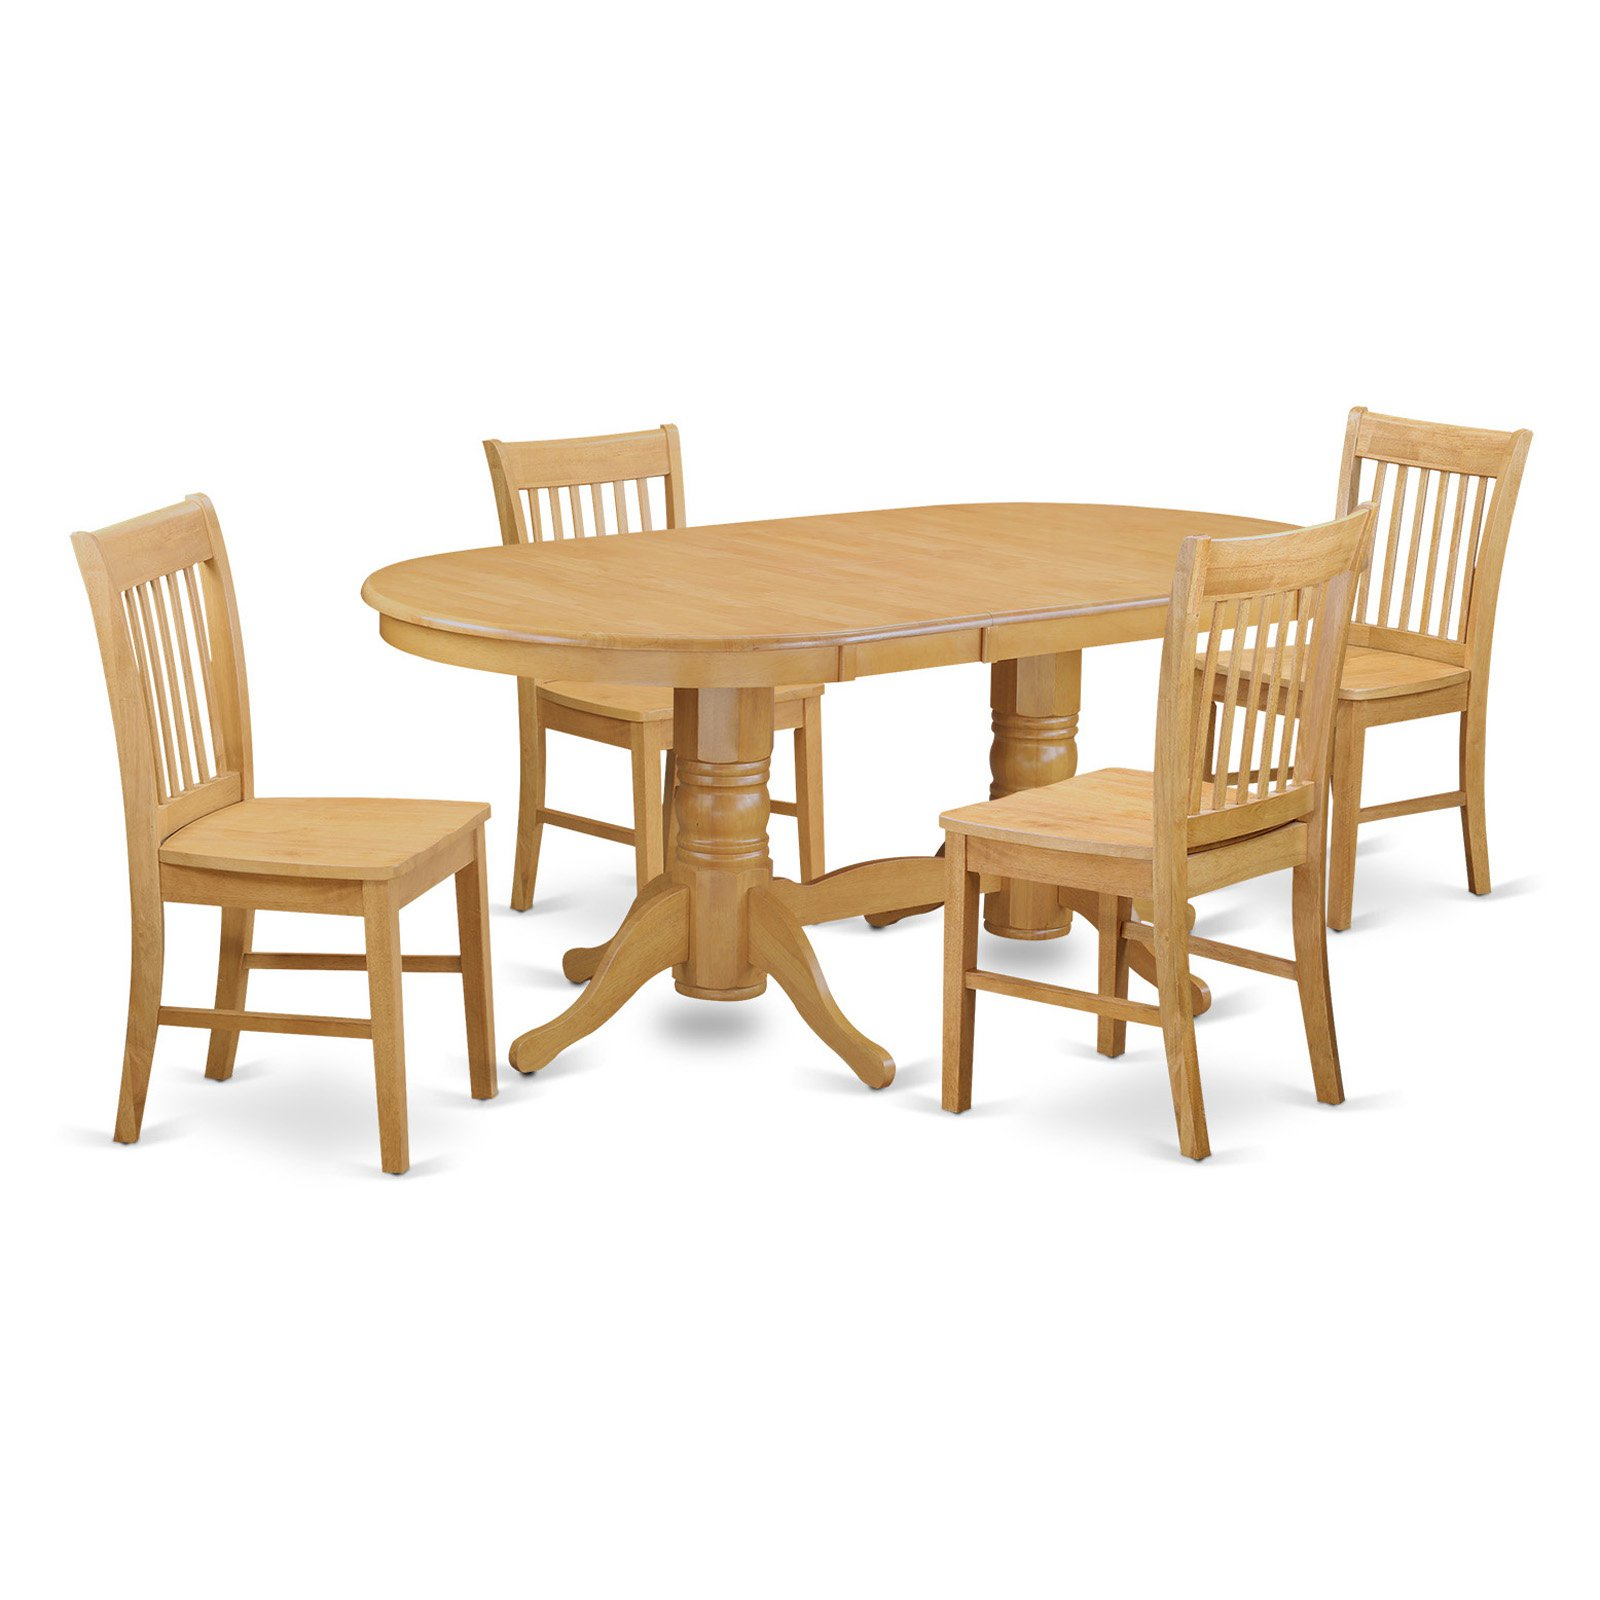 East West Furniture Vancouver 5 Piece Slat Back Dining Table Set